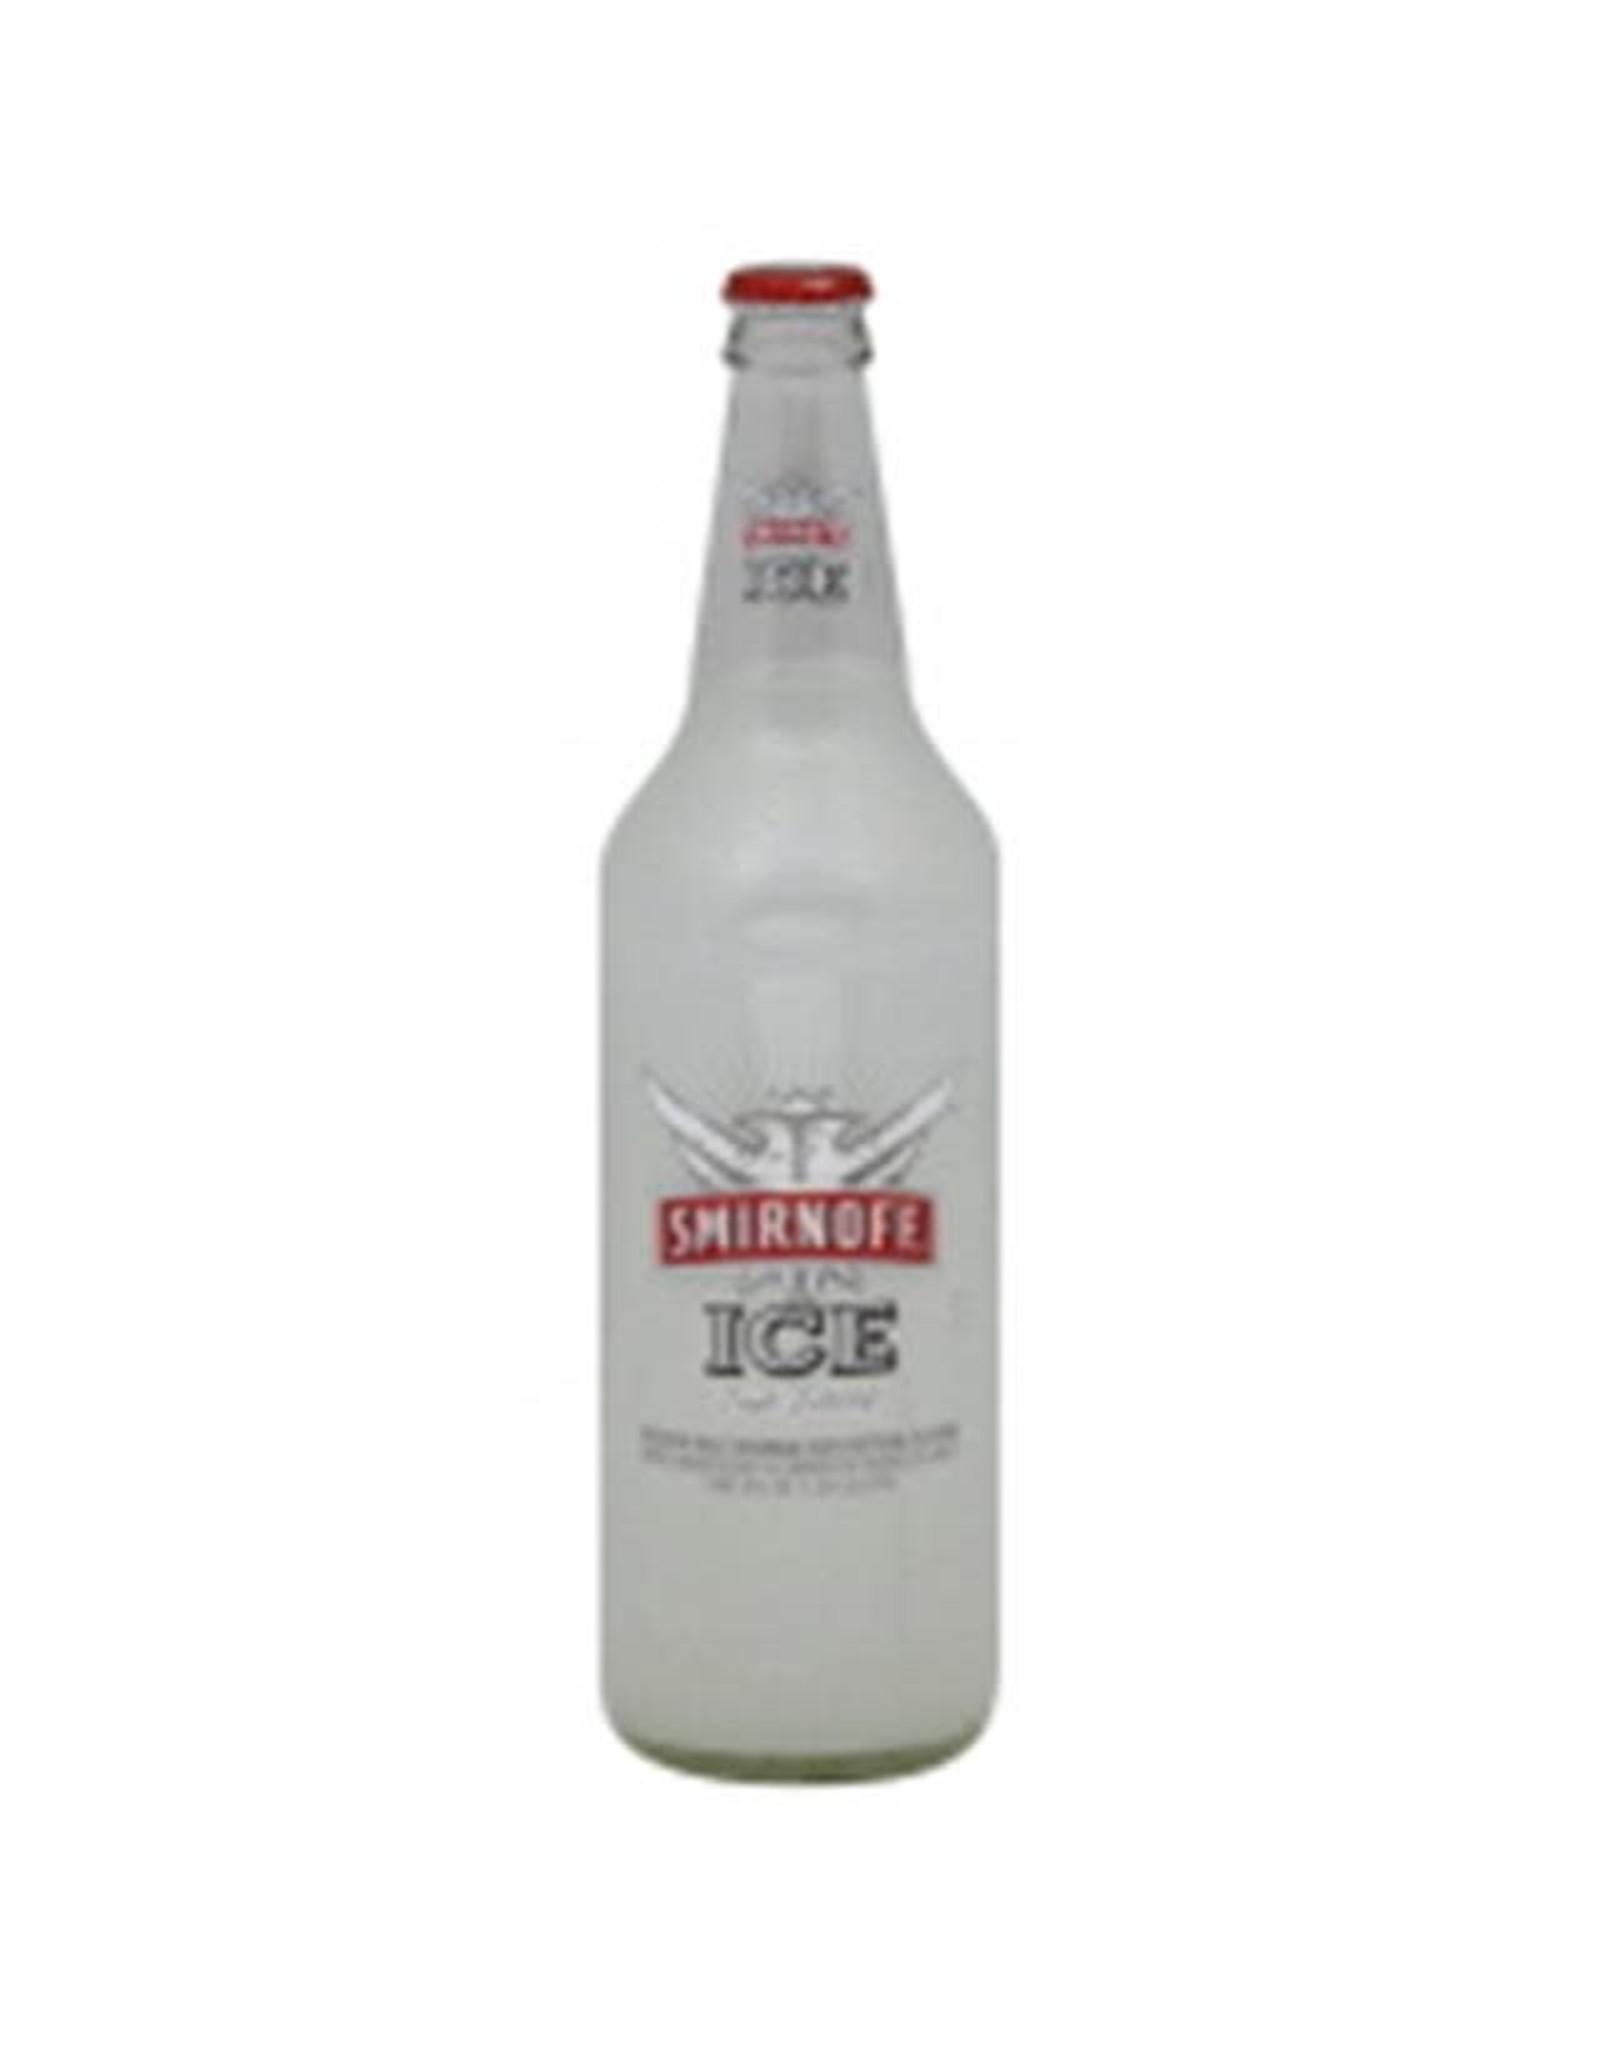 SMIRNOFF ICE 24OZ BOTTLE